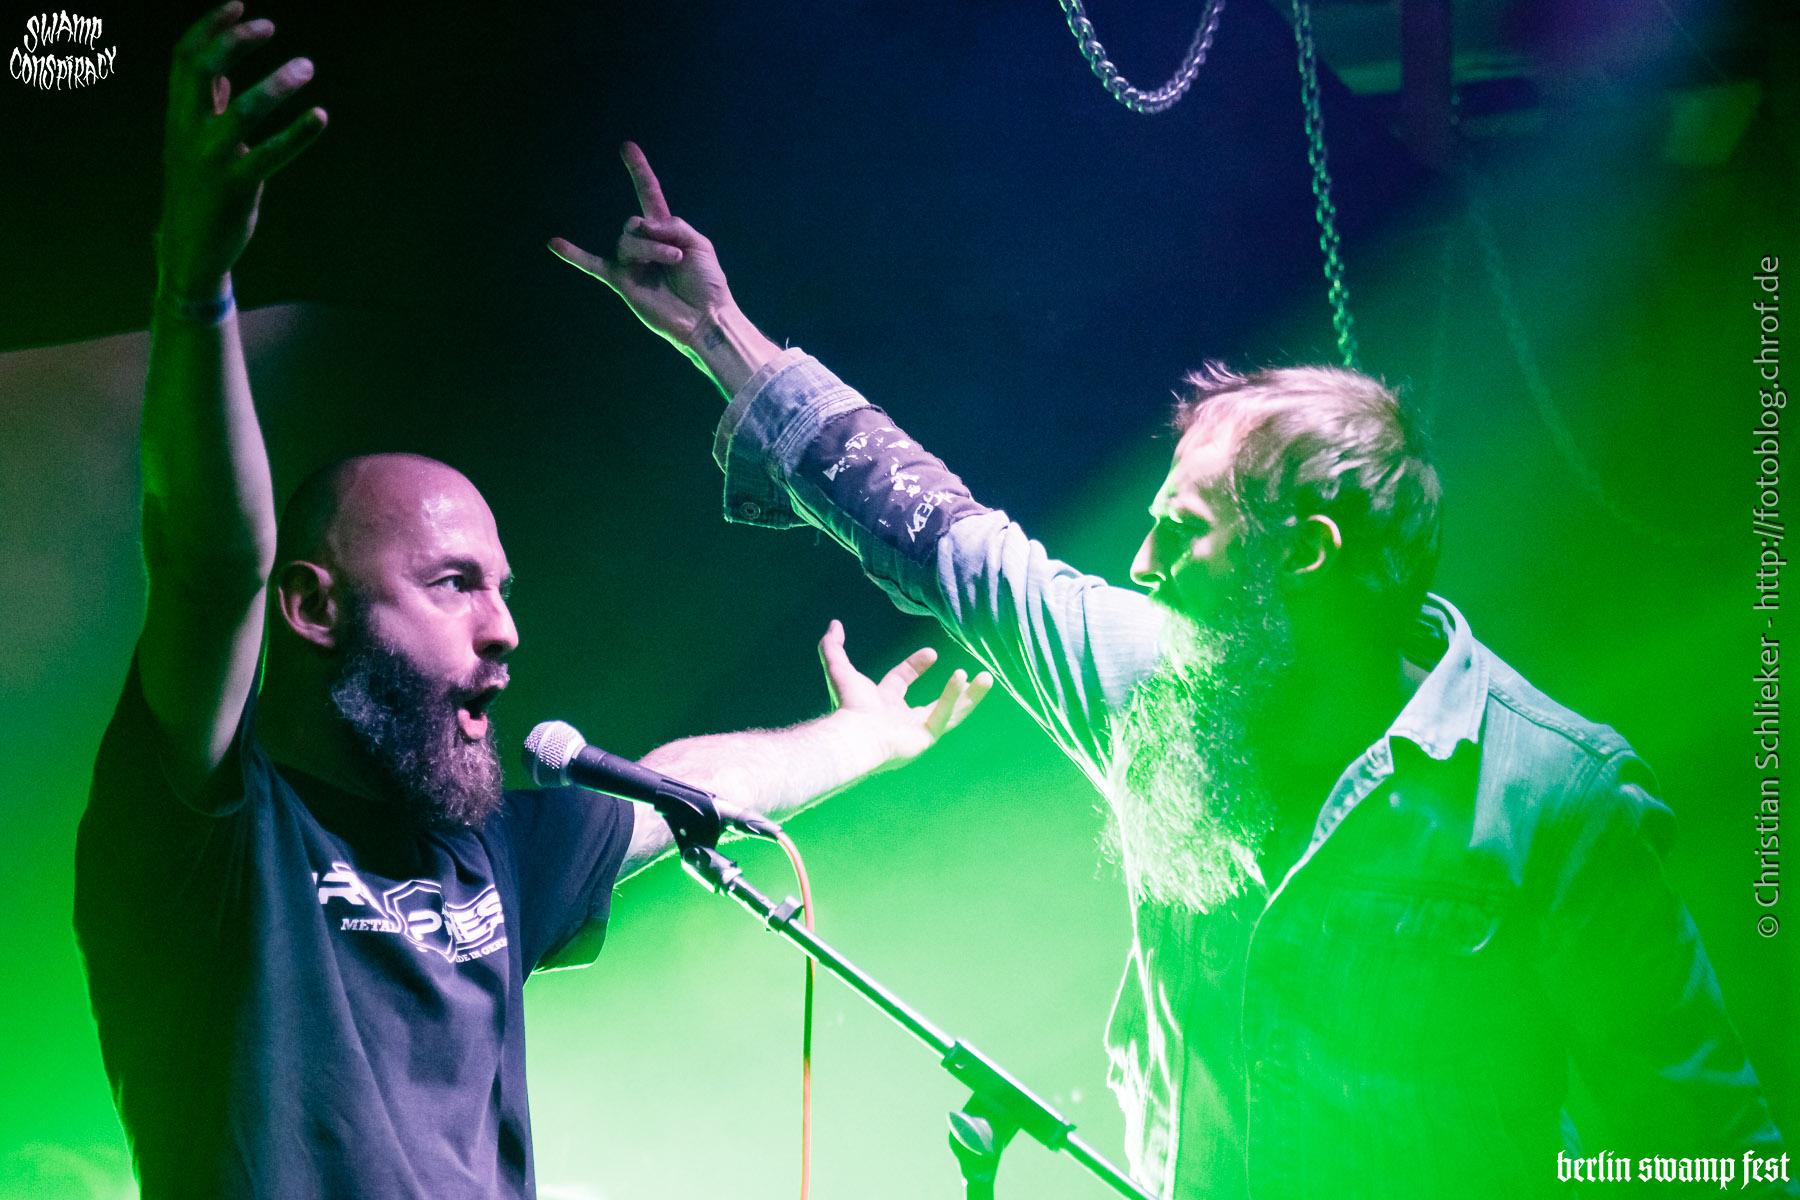 Berlin Swamp Fest 2017 Friday Upstairs